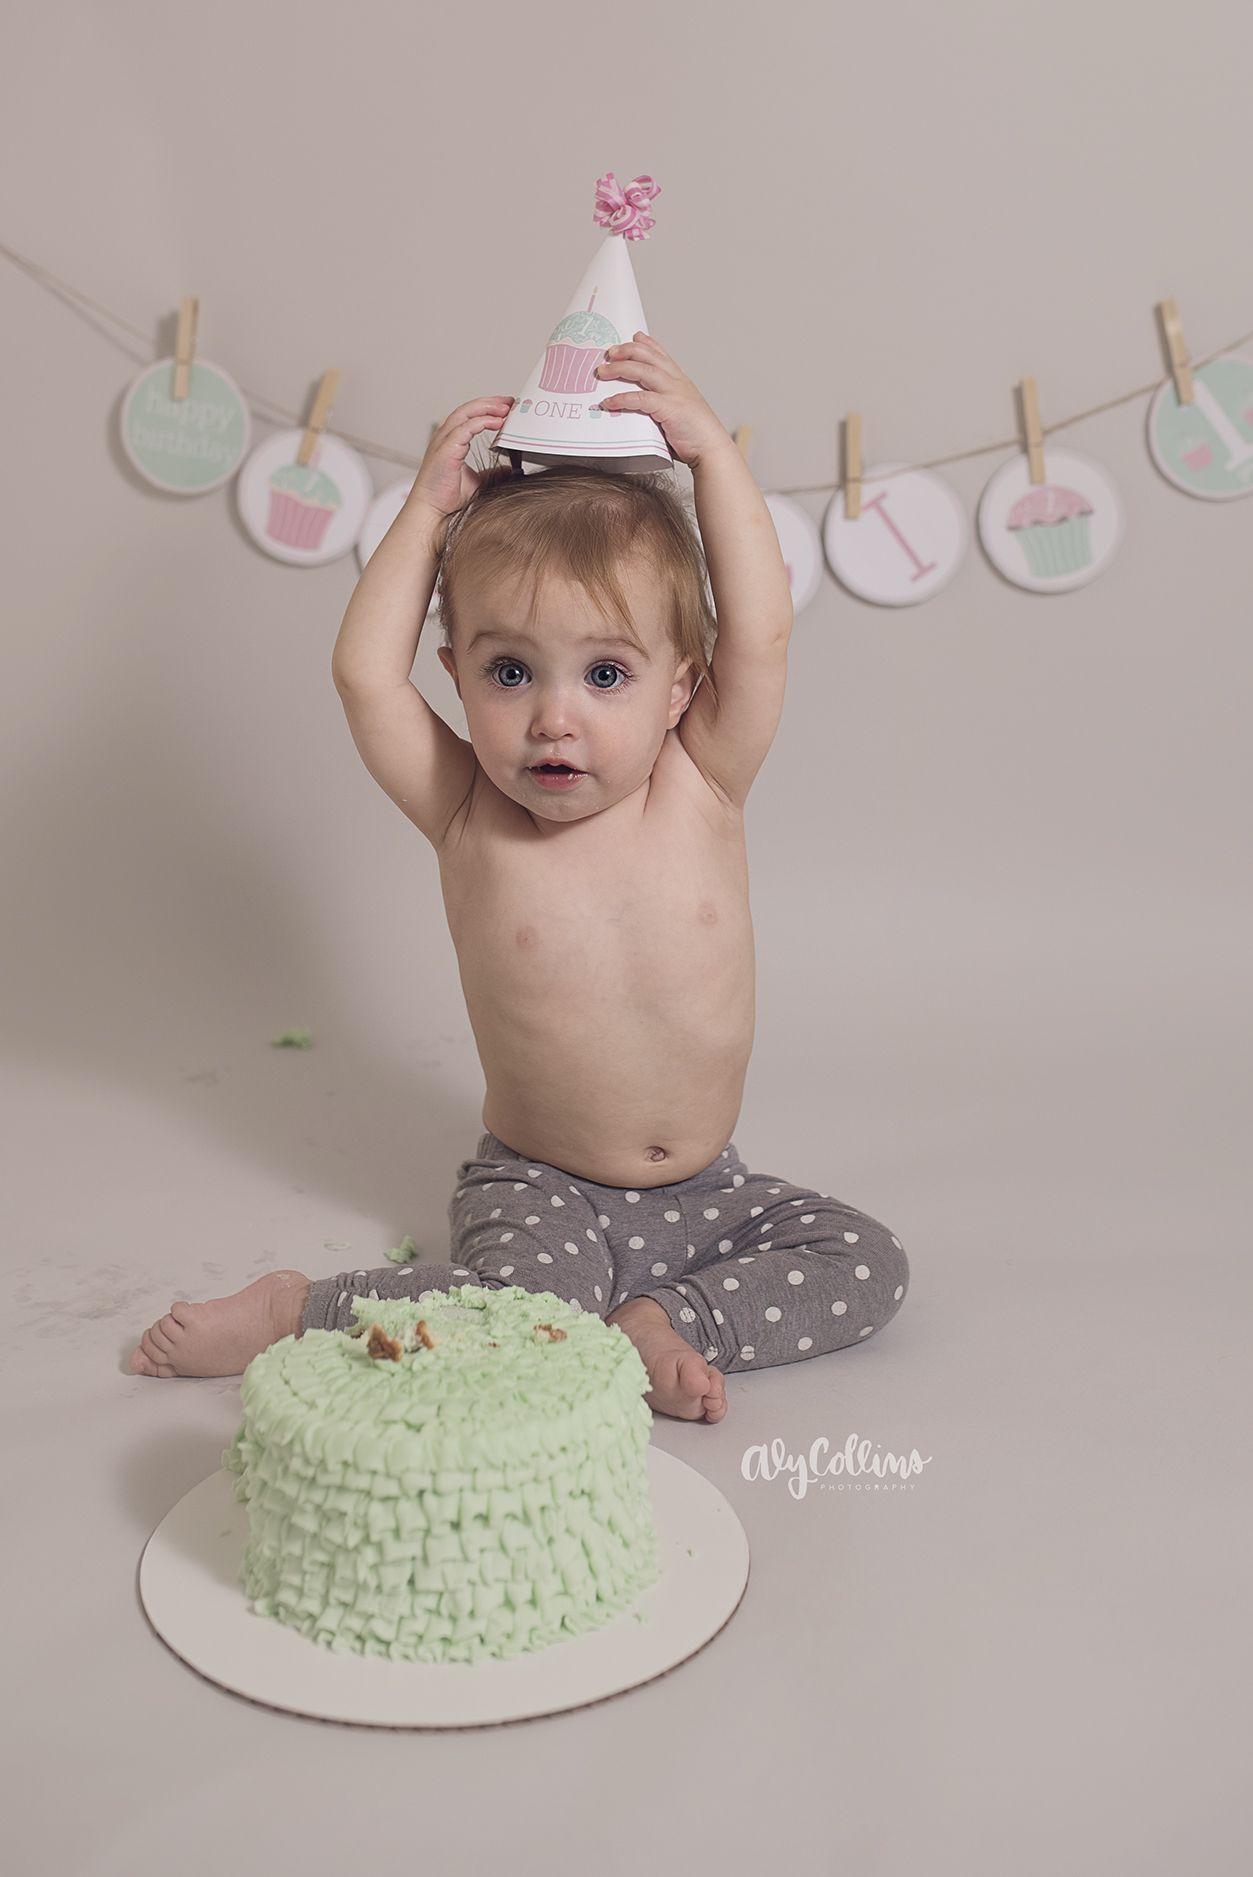 Groovy Aly Collins Photography Salt Lake City Utah Cake Smash Funny Birthday Cards Online Inifofree Goldxyz